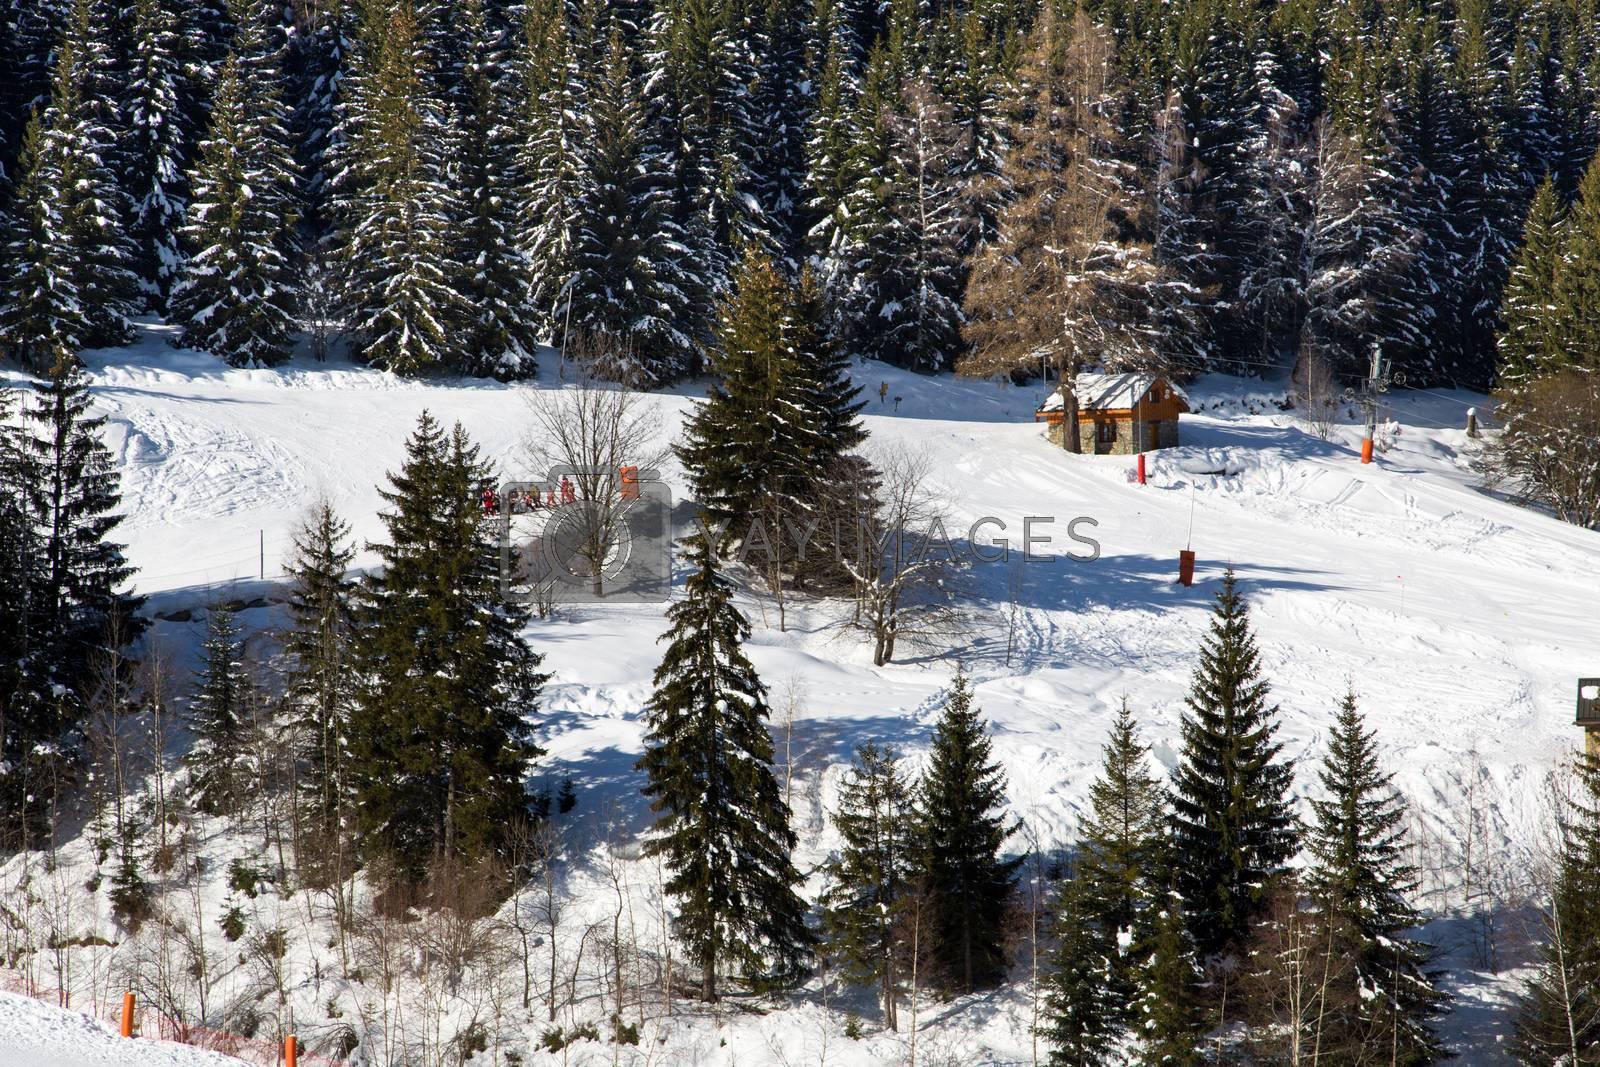 Alps in winter - 13 by Kartouchken